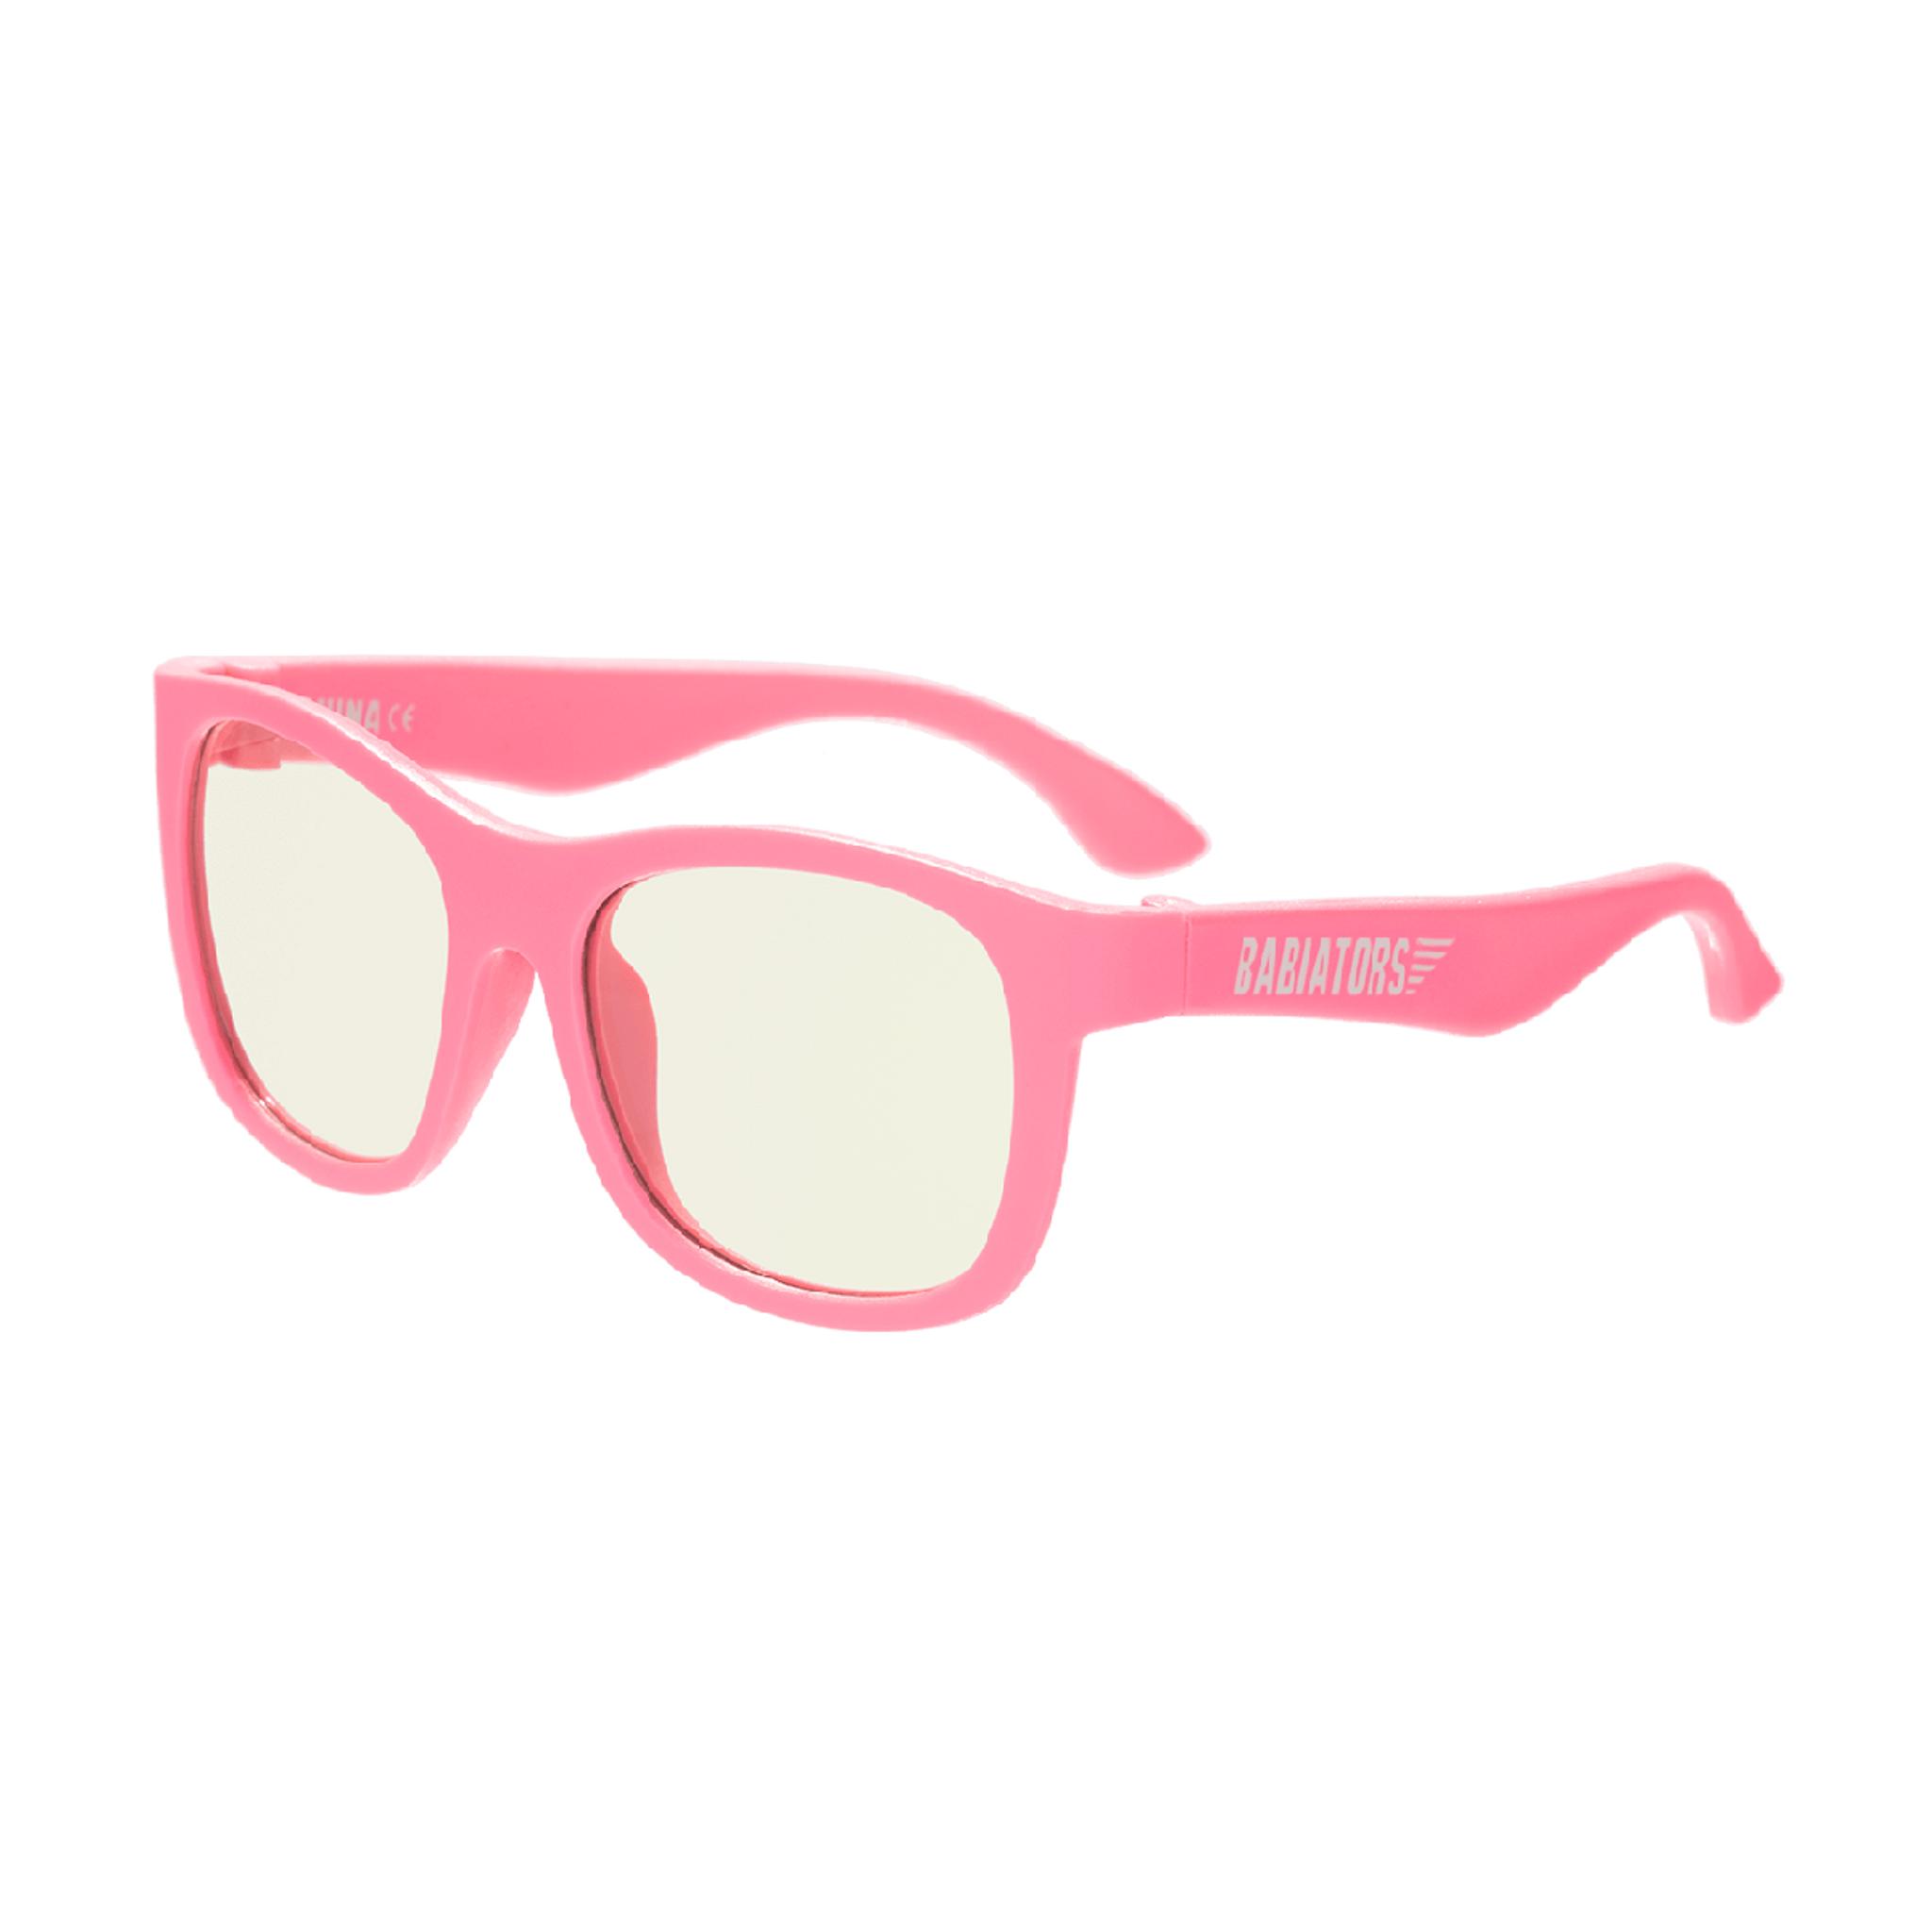 Babiators Blue Light Glasses - Pink